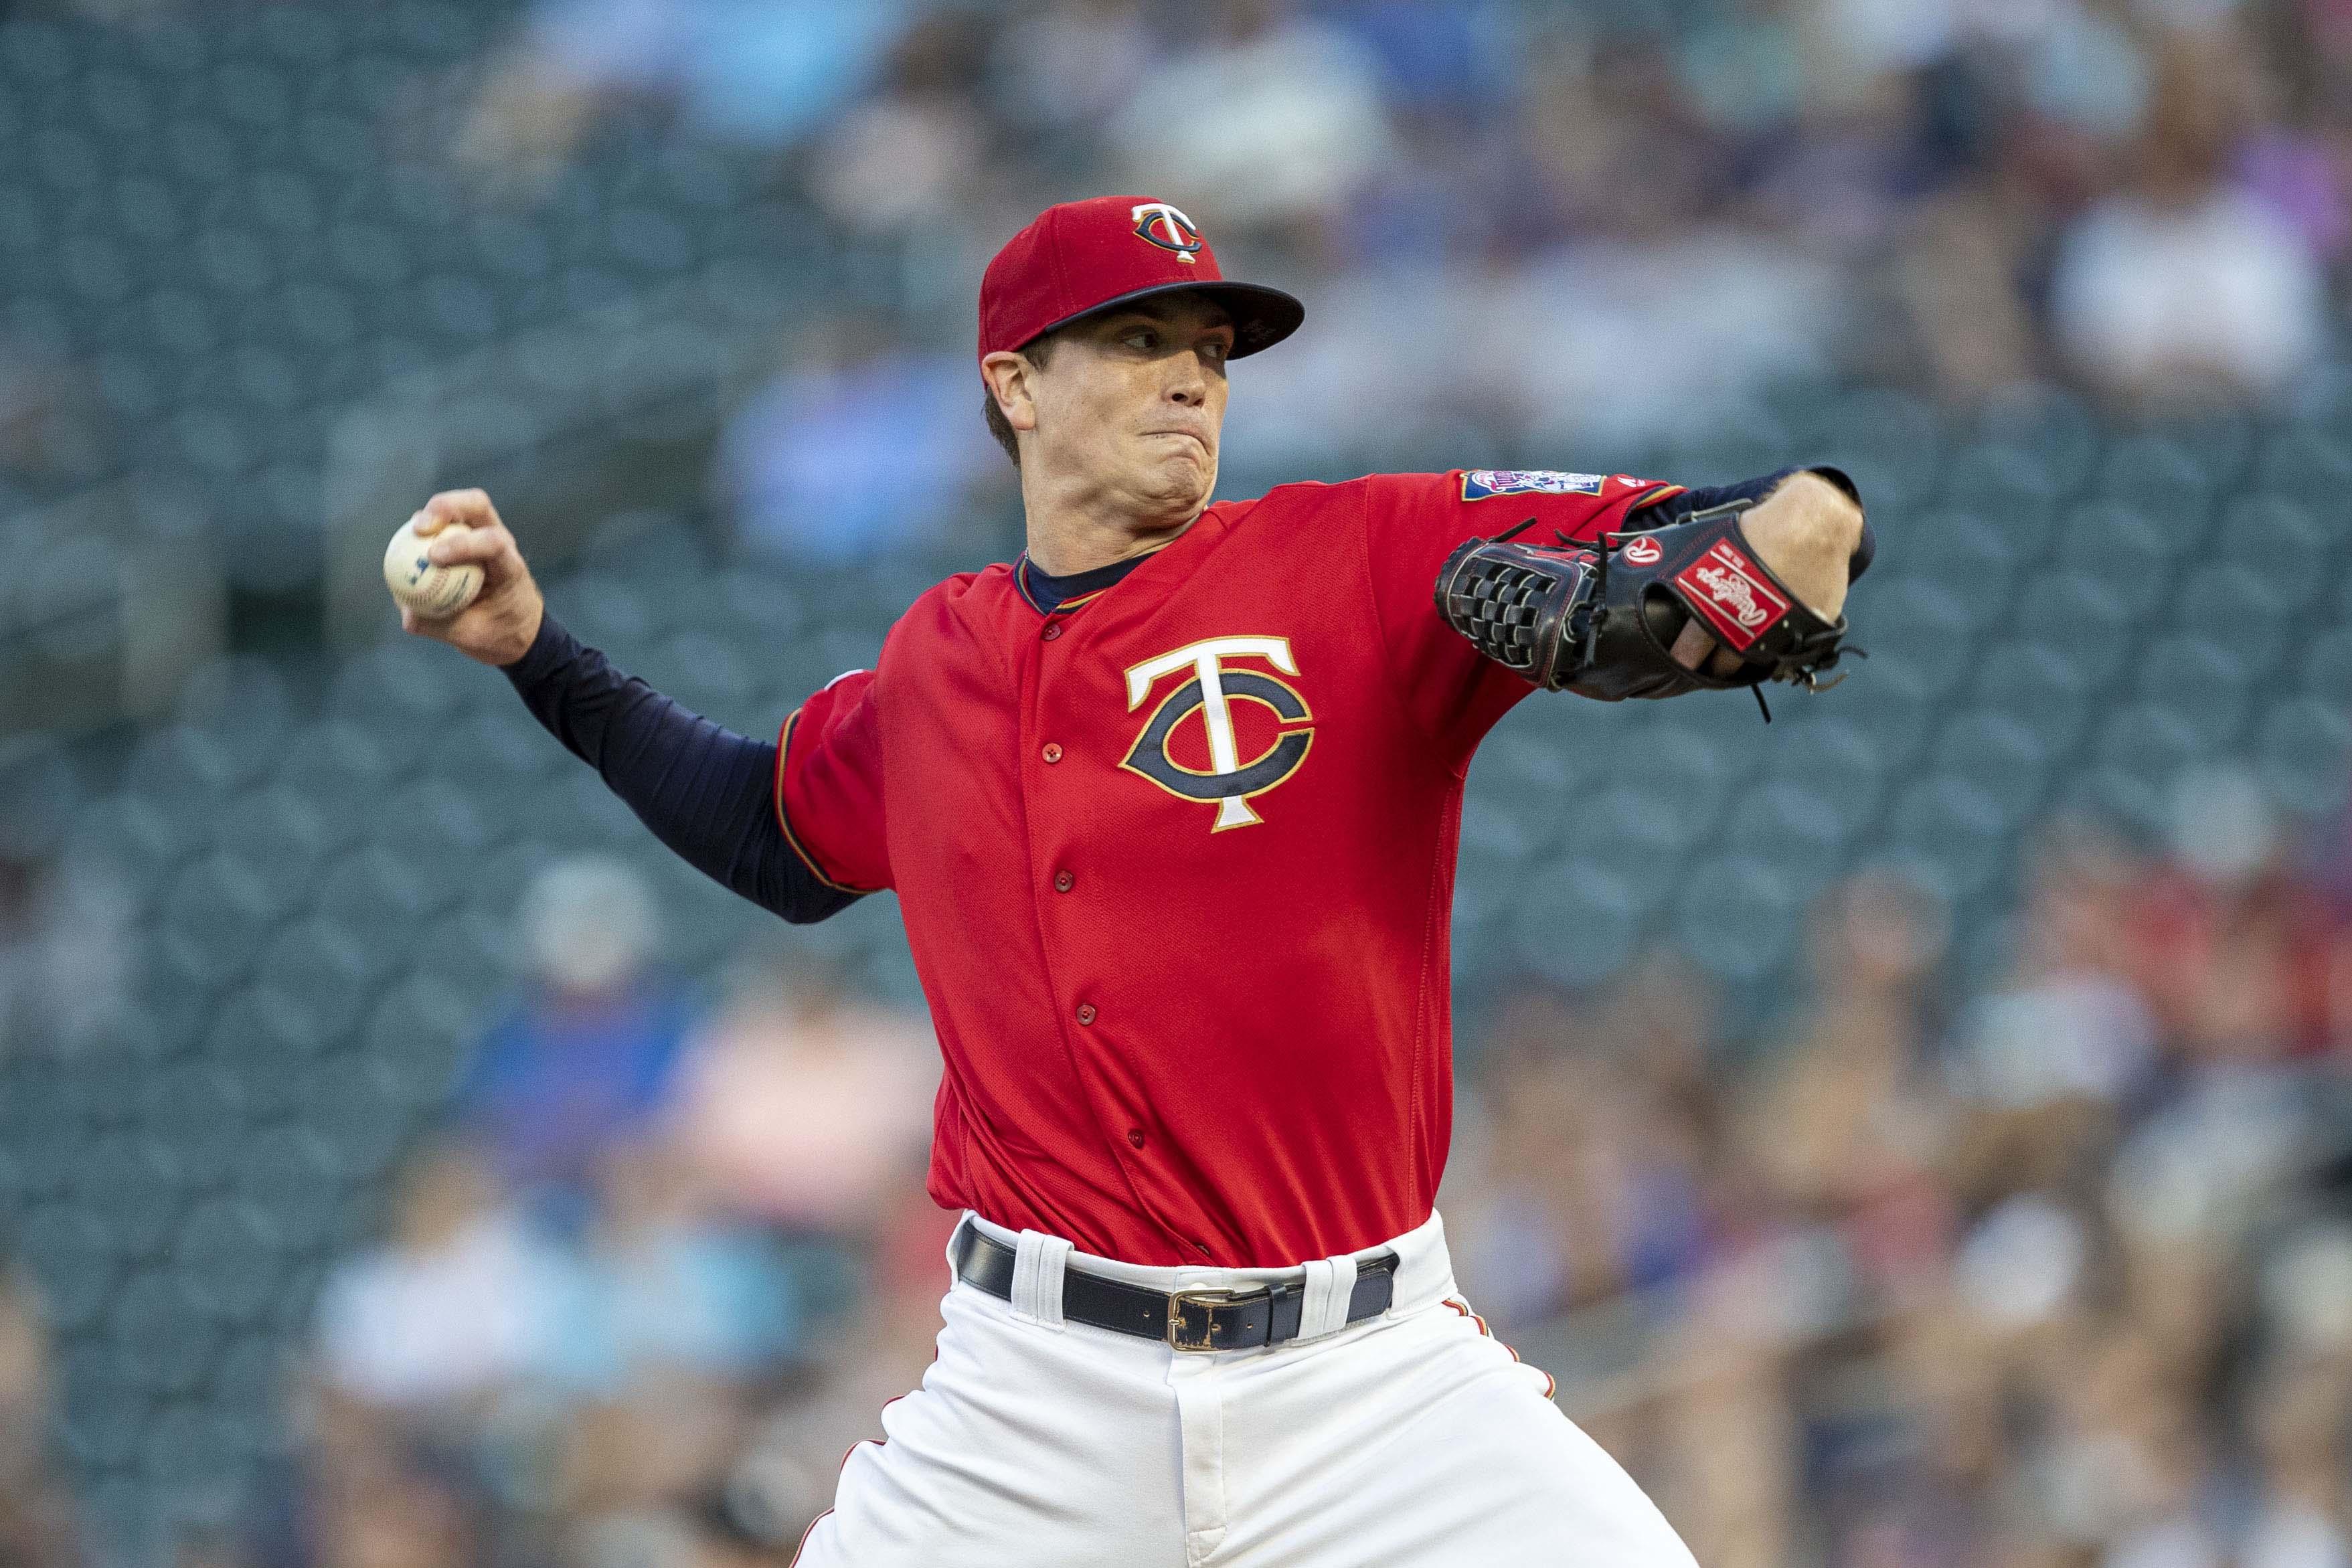 MLB: Chicago White Sox at Minnesota Twins